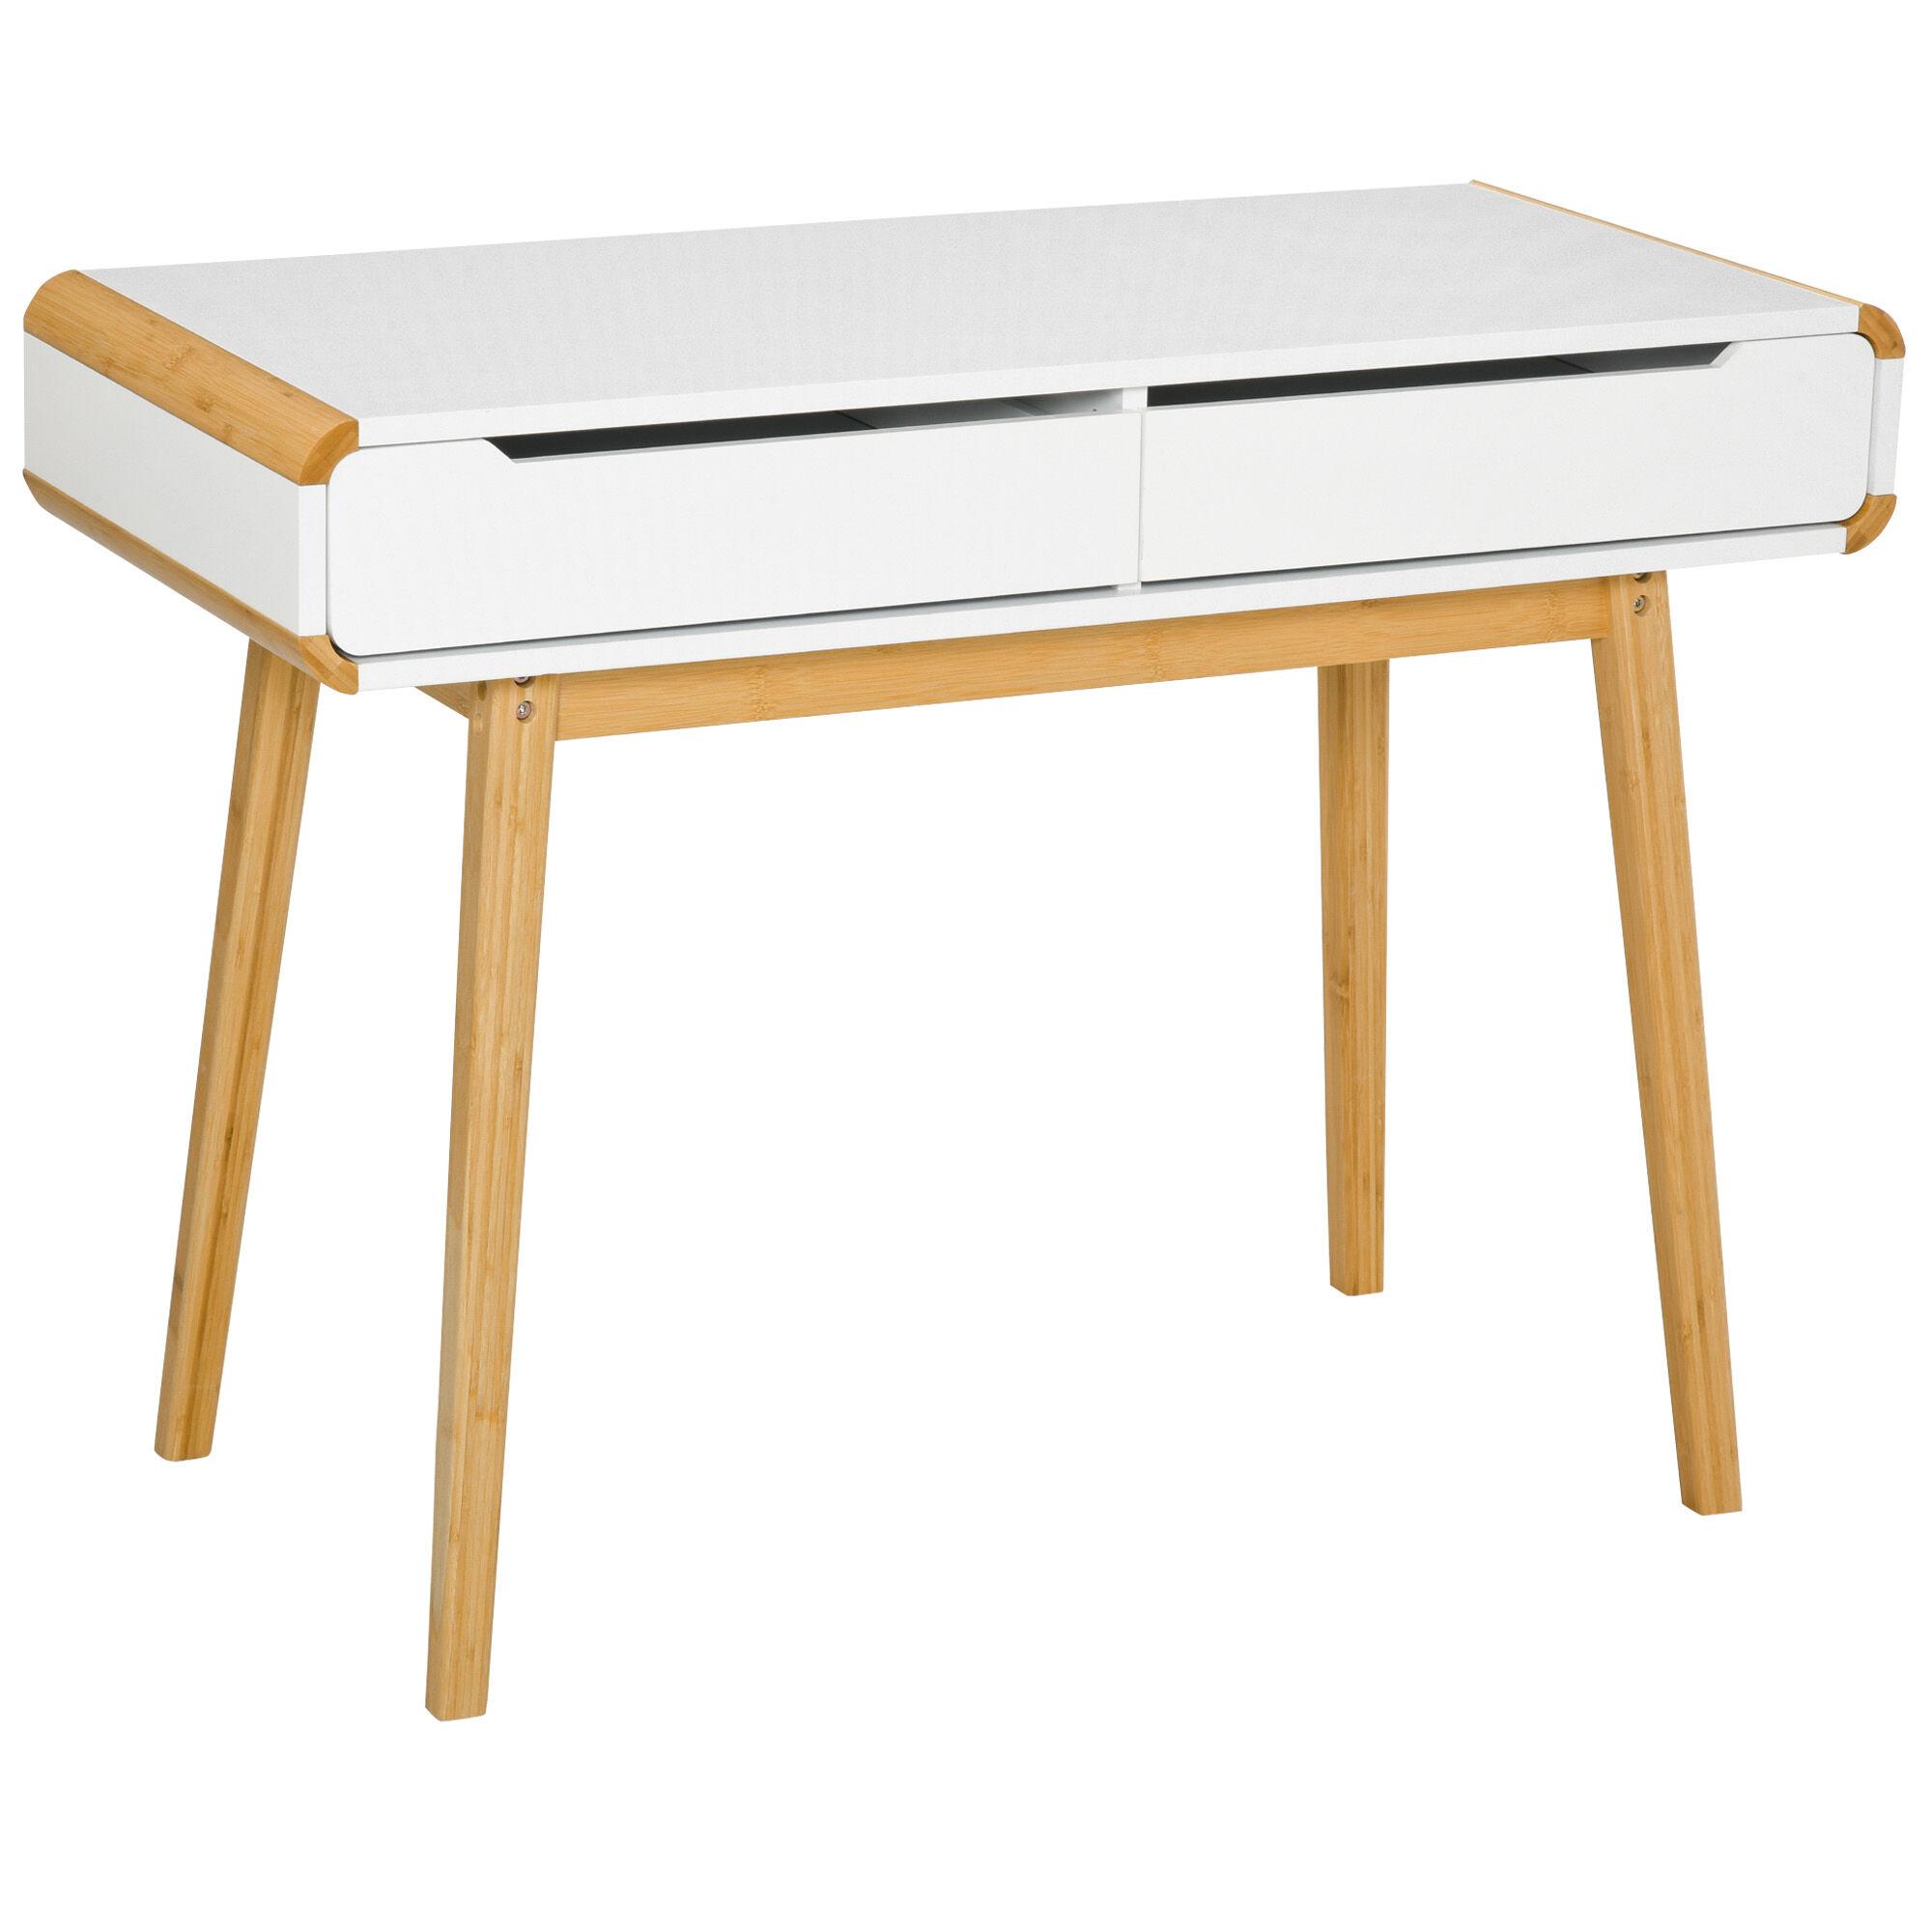 Homcom Bureau secrétaire style scandinave 2 tiroirs blanc bois massif bambou